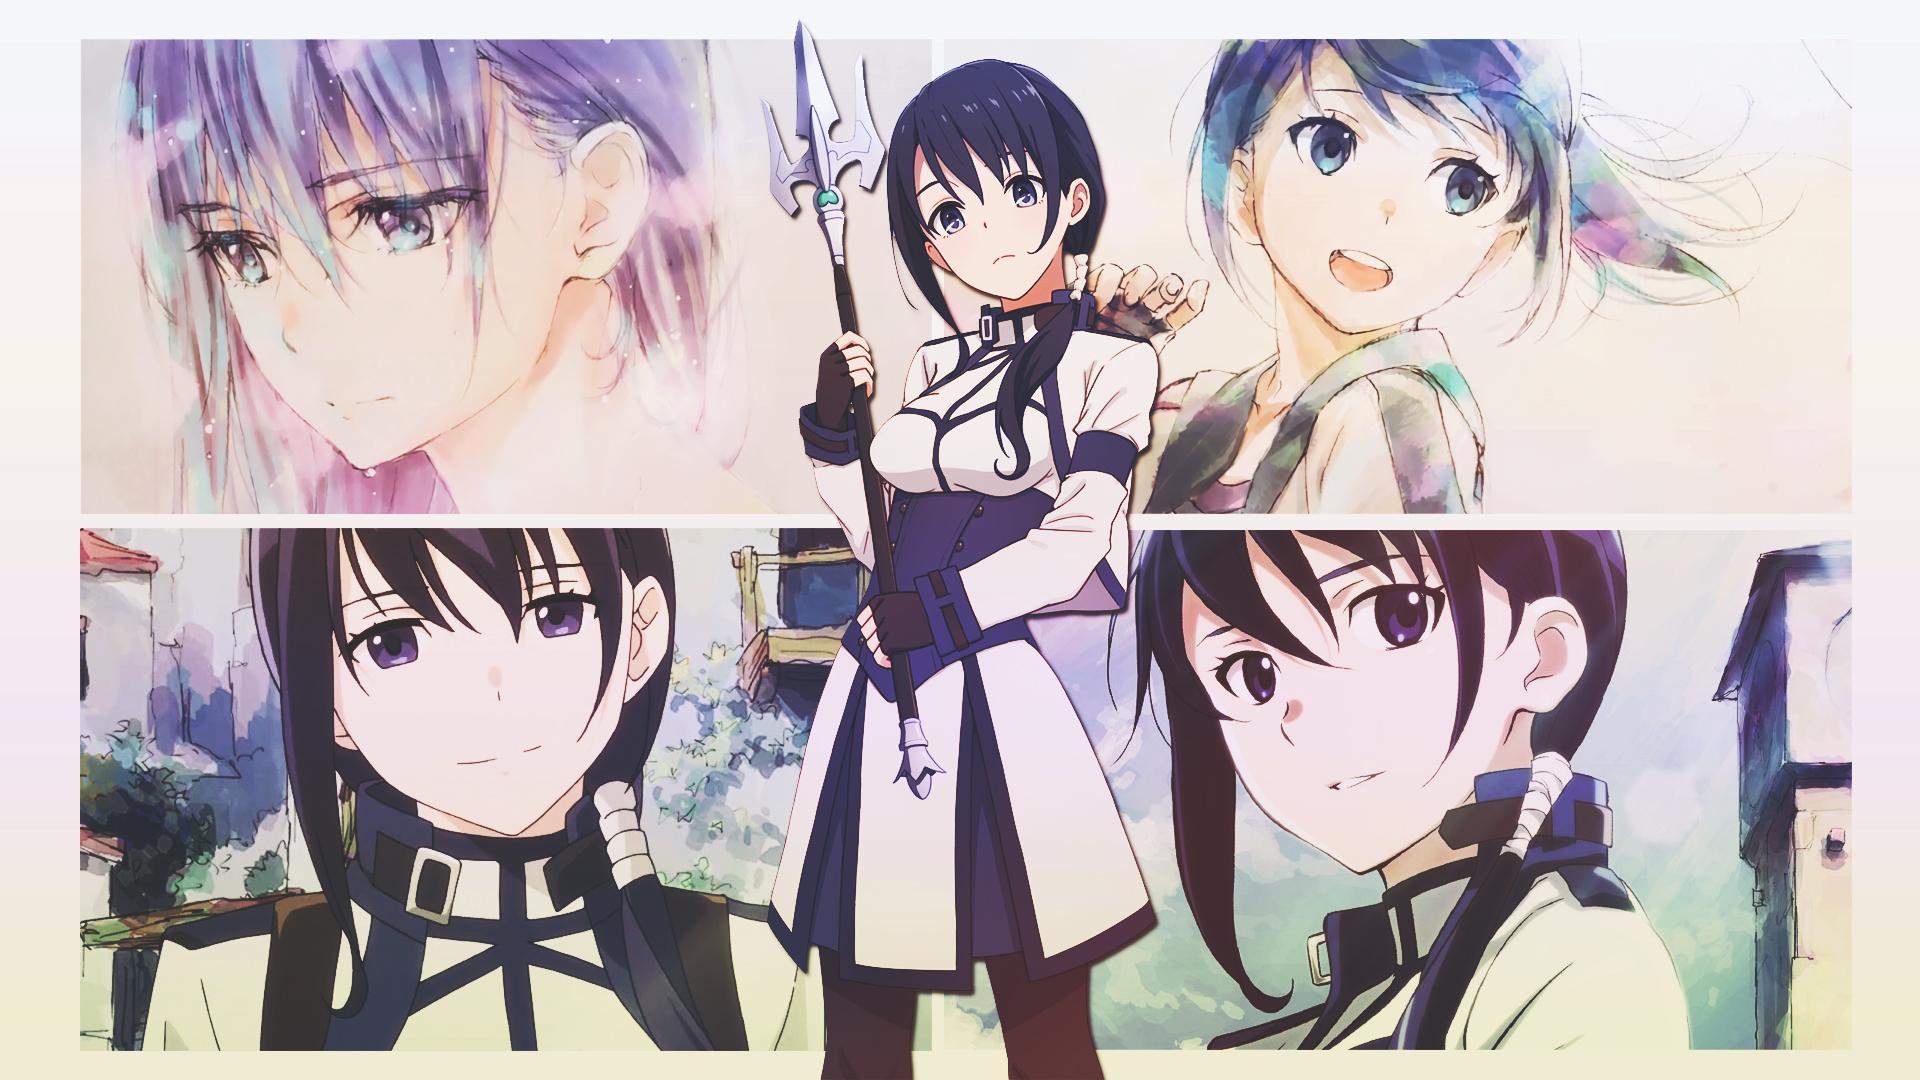 Wallpaper Anime Girls Mary Hai To Gensou No Grimgar Hai To